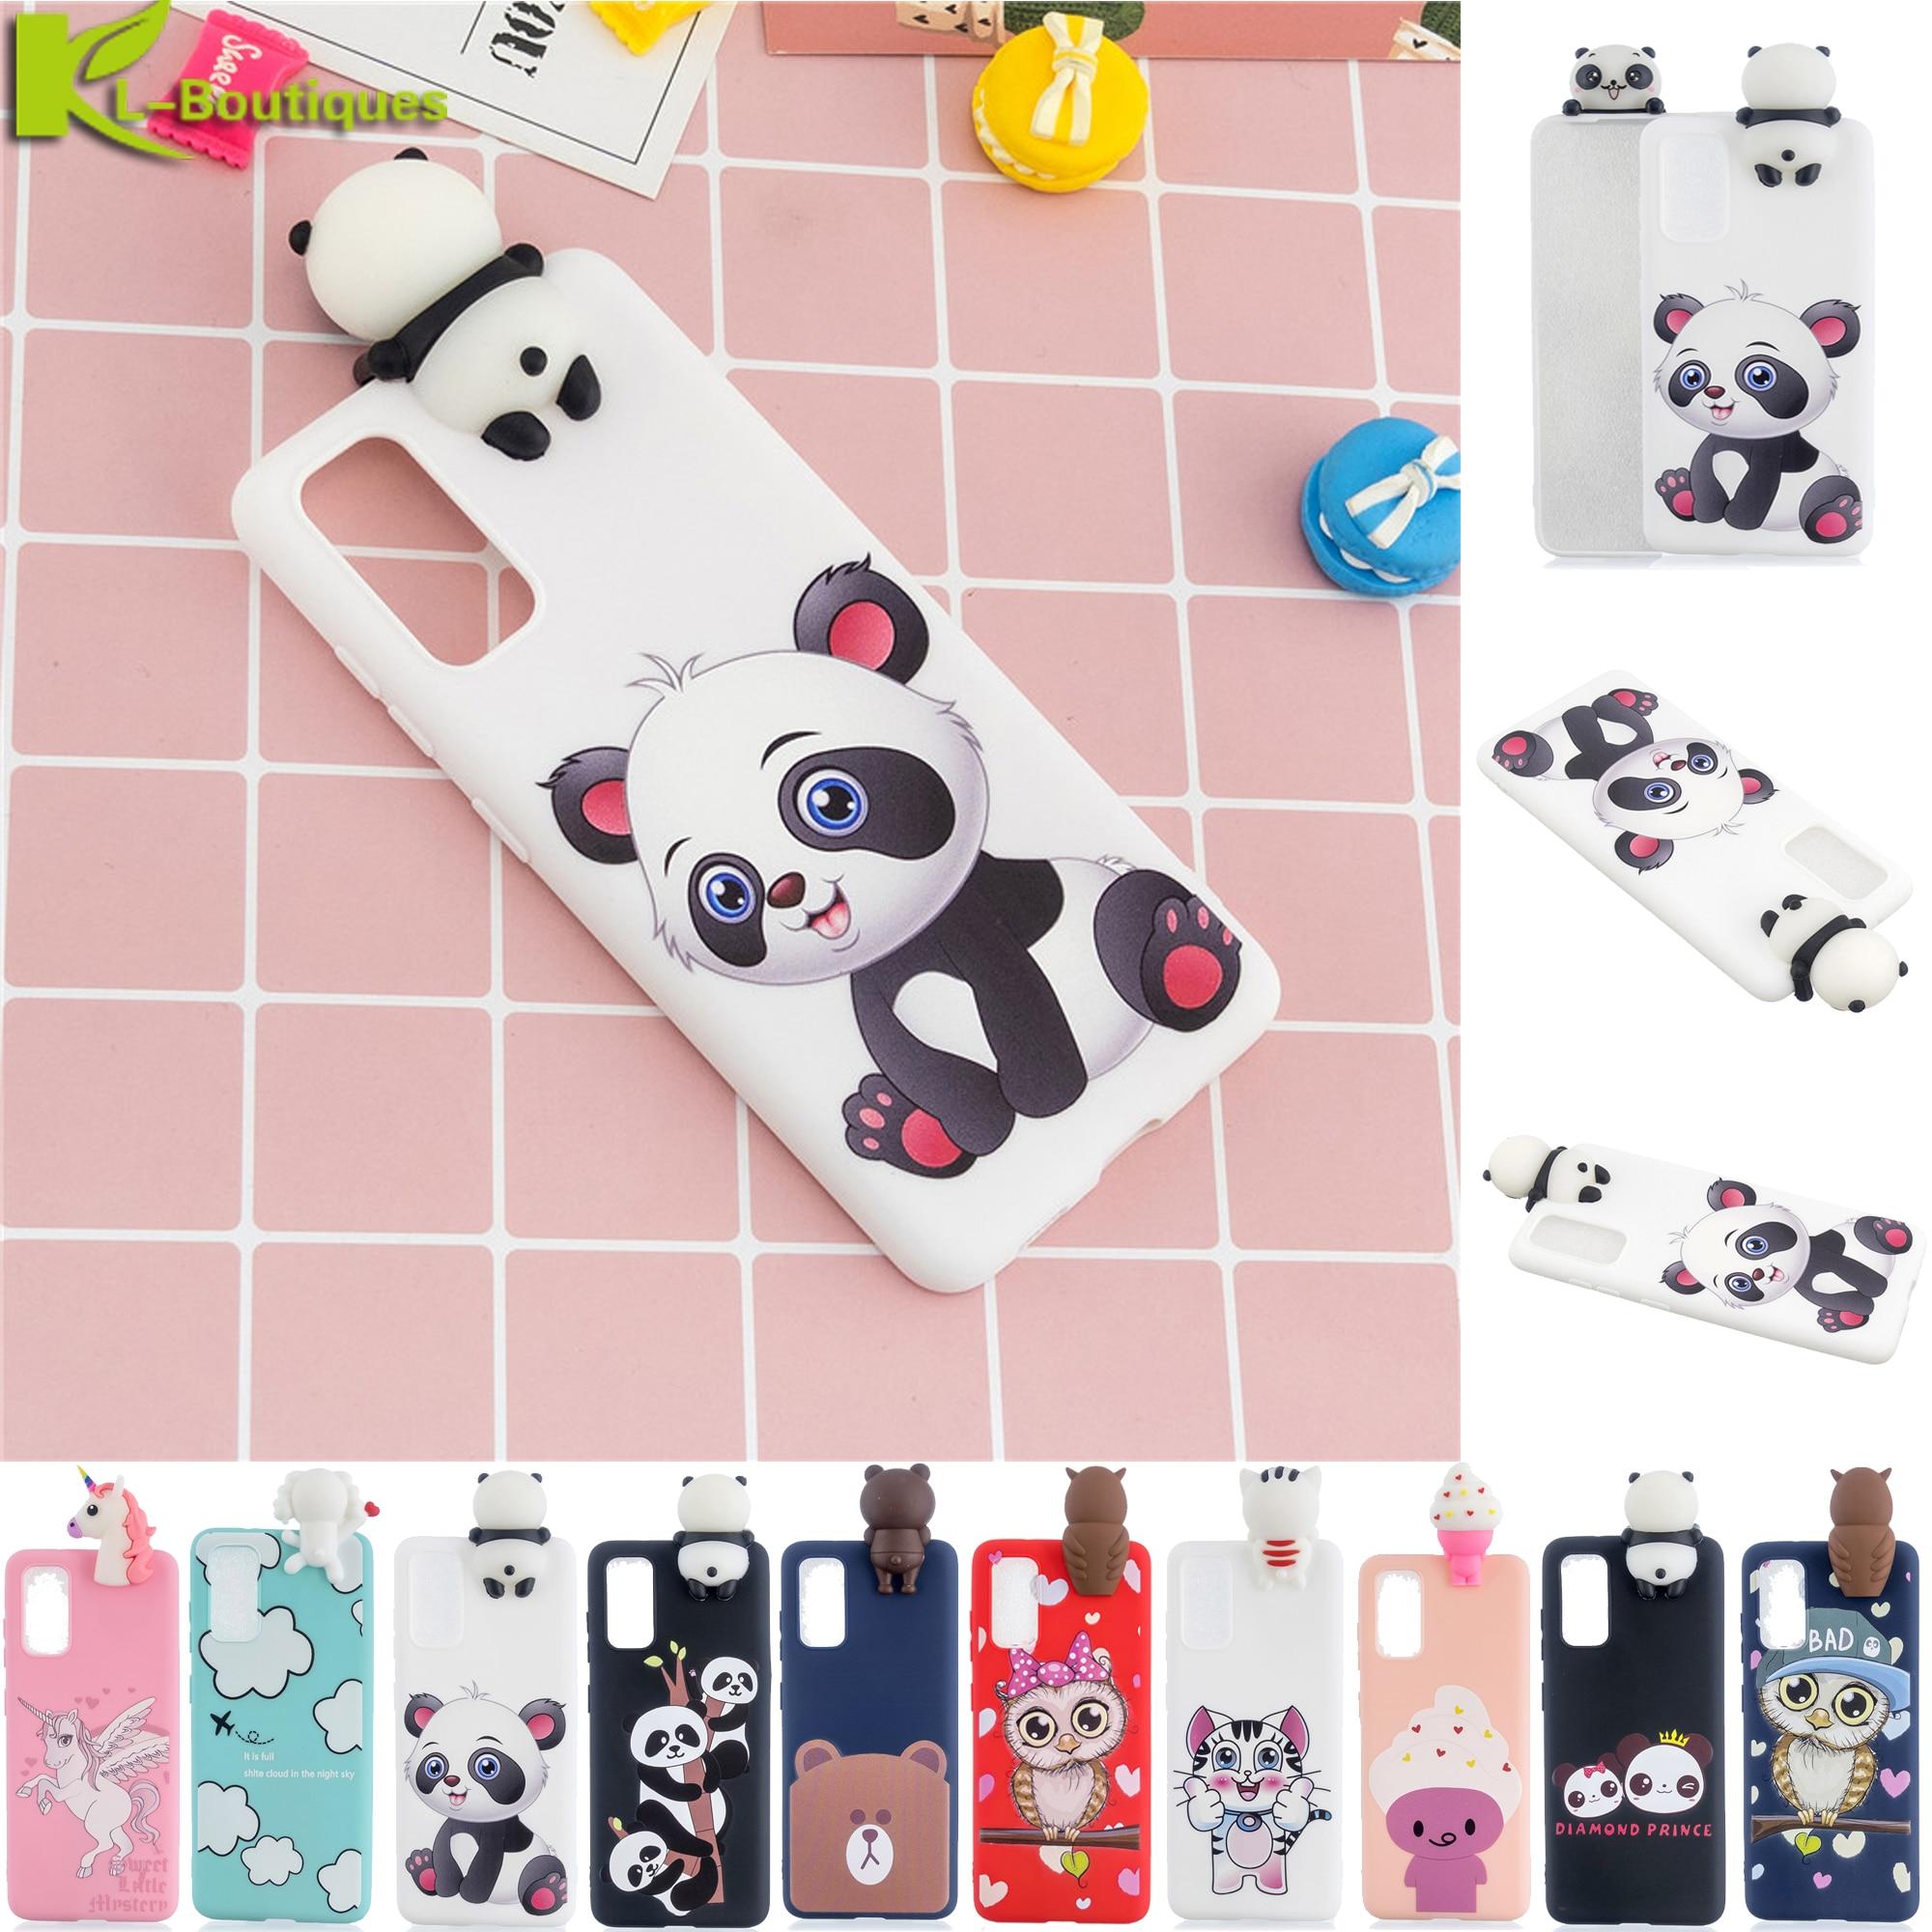 A21S Case Na Sfor Samsung Galaxy A21S SM-A217F/DS SM-A217F/DSN Case DIY 3D Doll Toy Unicorn Panda Soft TPU Cover On A21 S A 21S